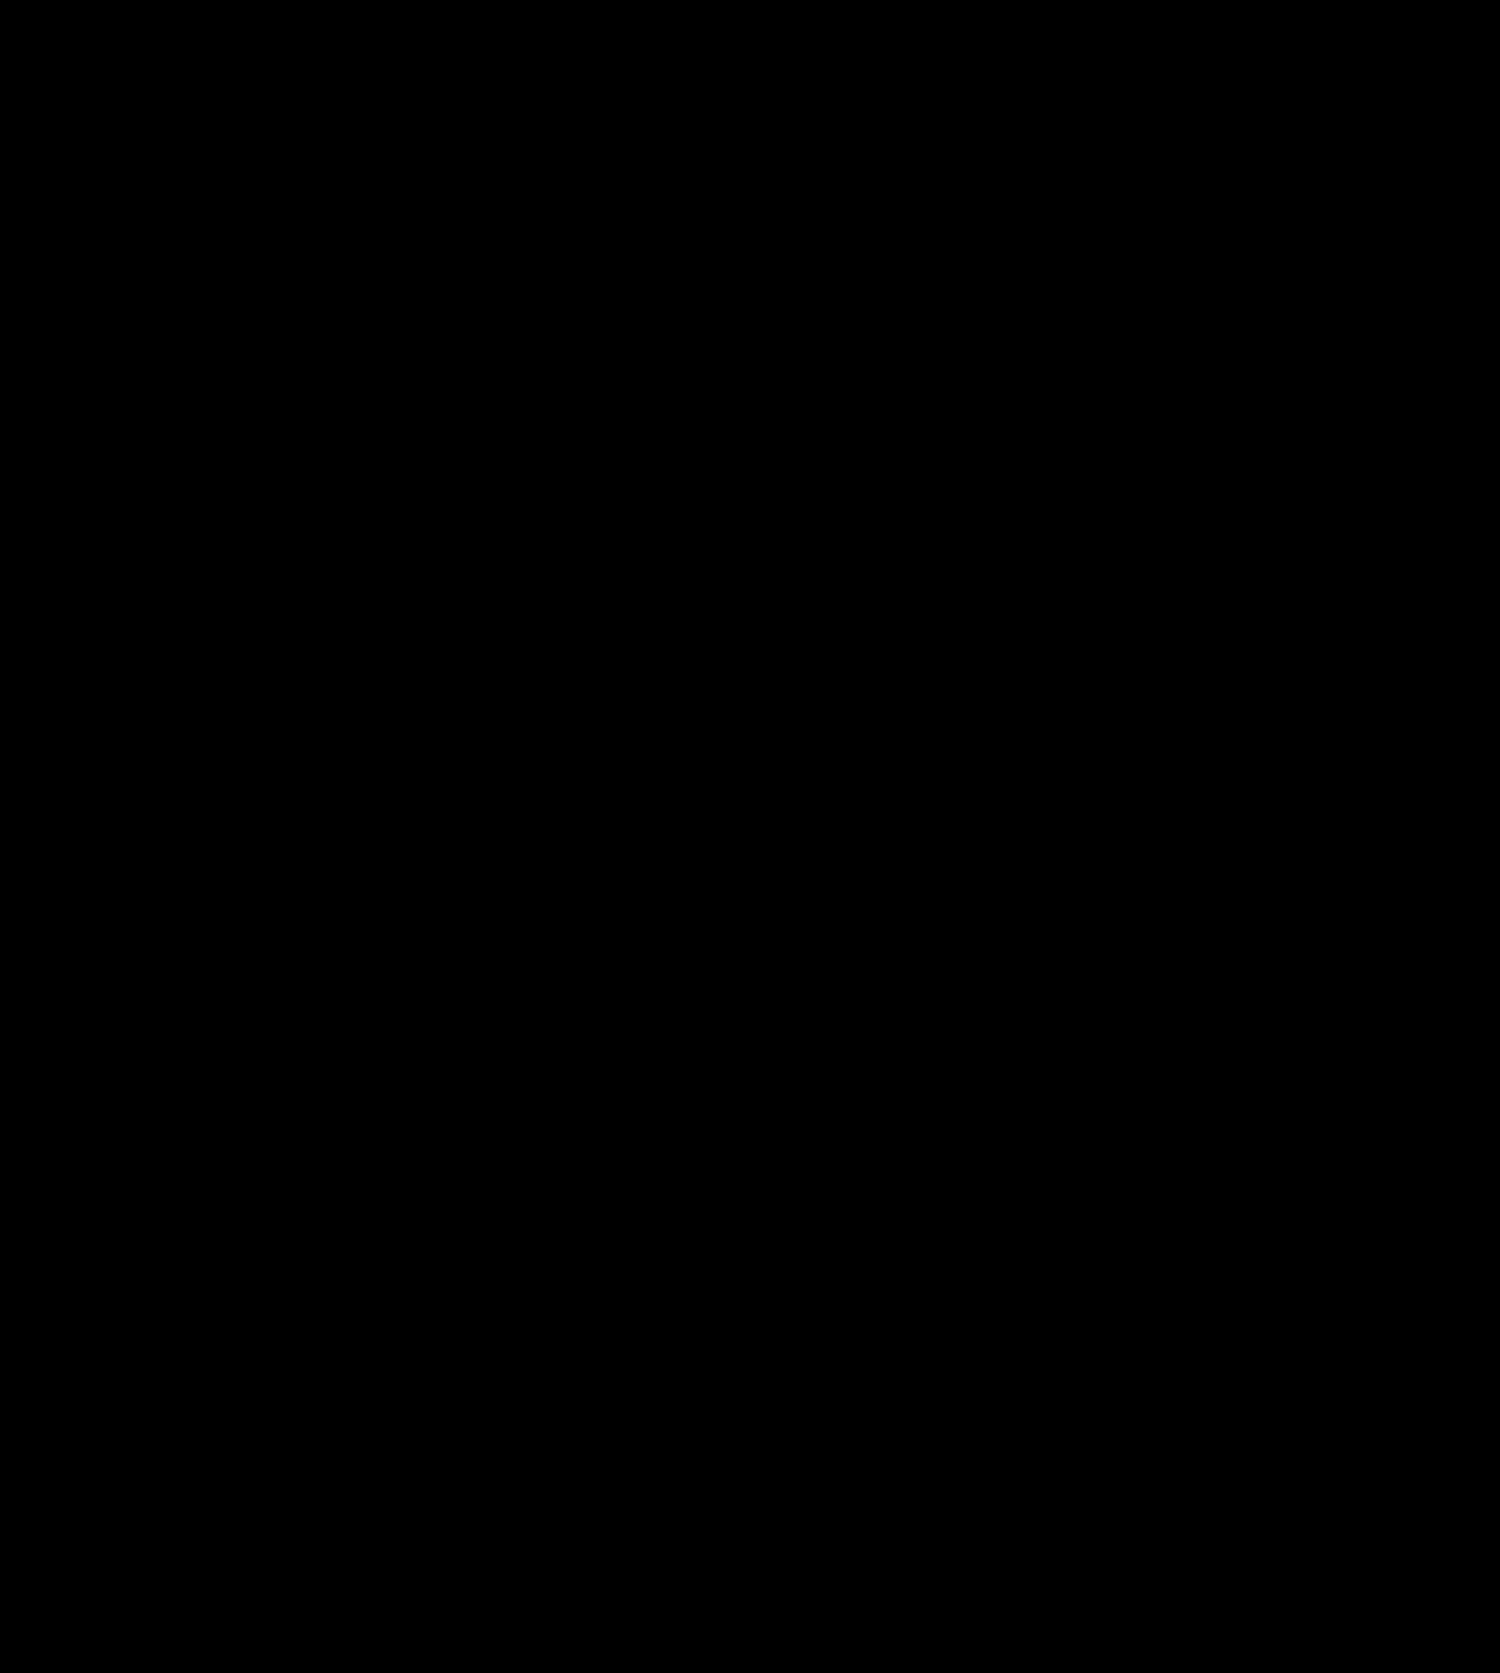 mvp_1716-1